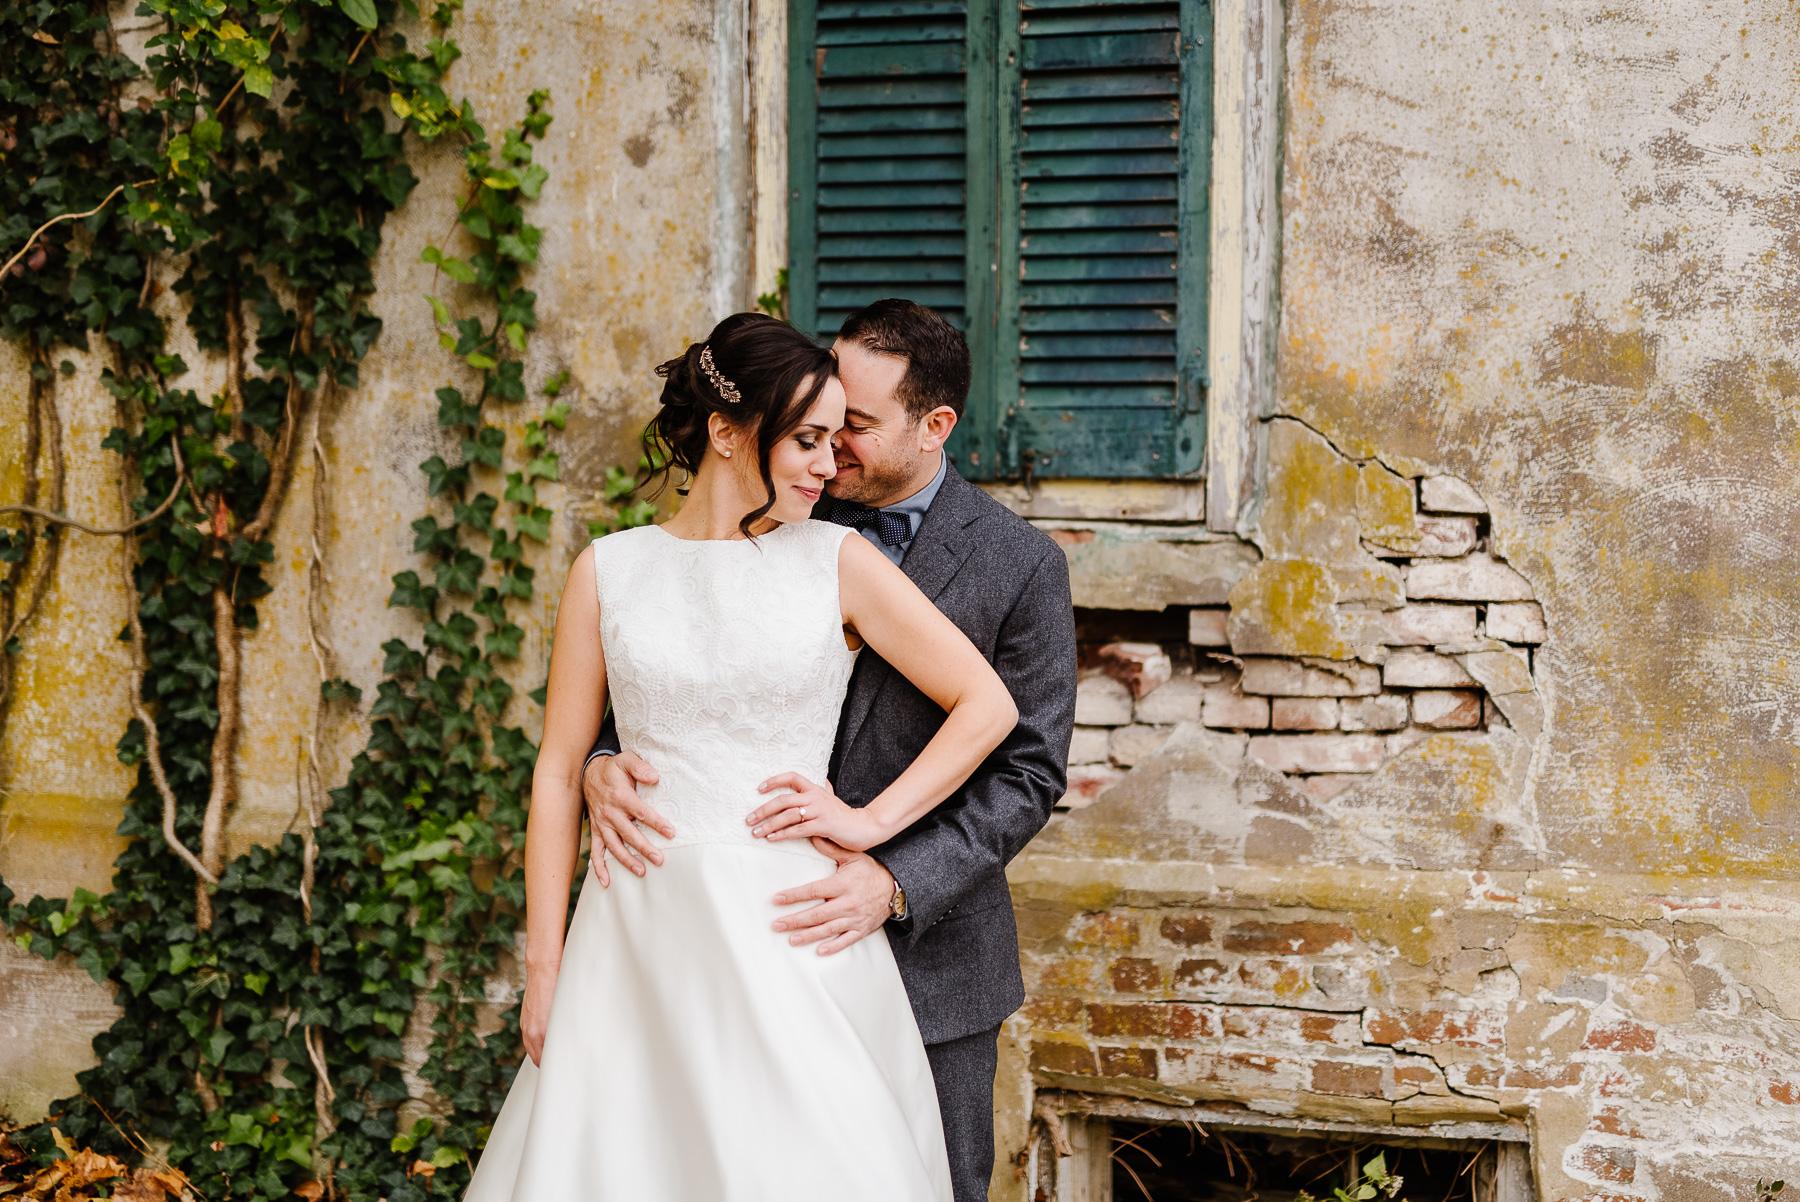 22-Laurita Winery Wedding New Jersey Wedding Photographer Laurita Winery Weddings Longbrook Photography.jpg